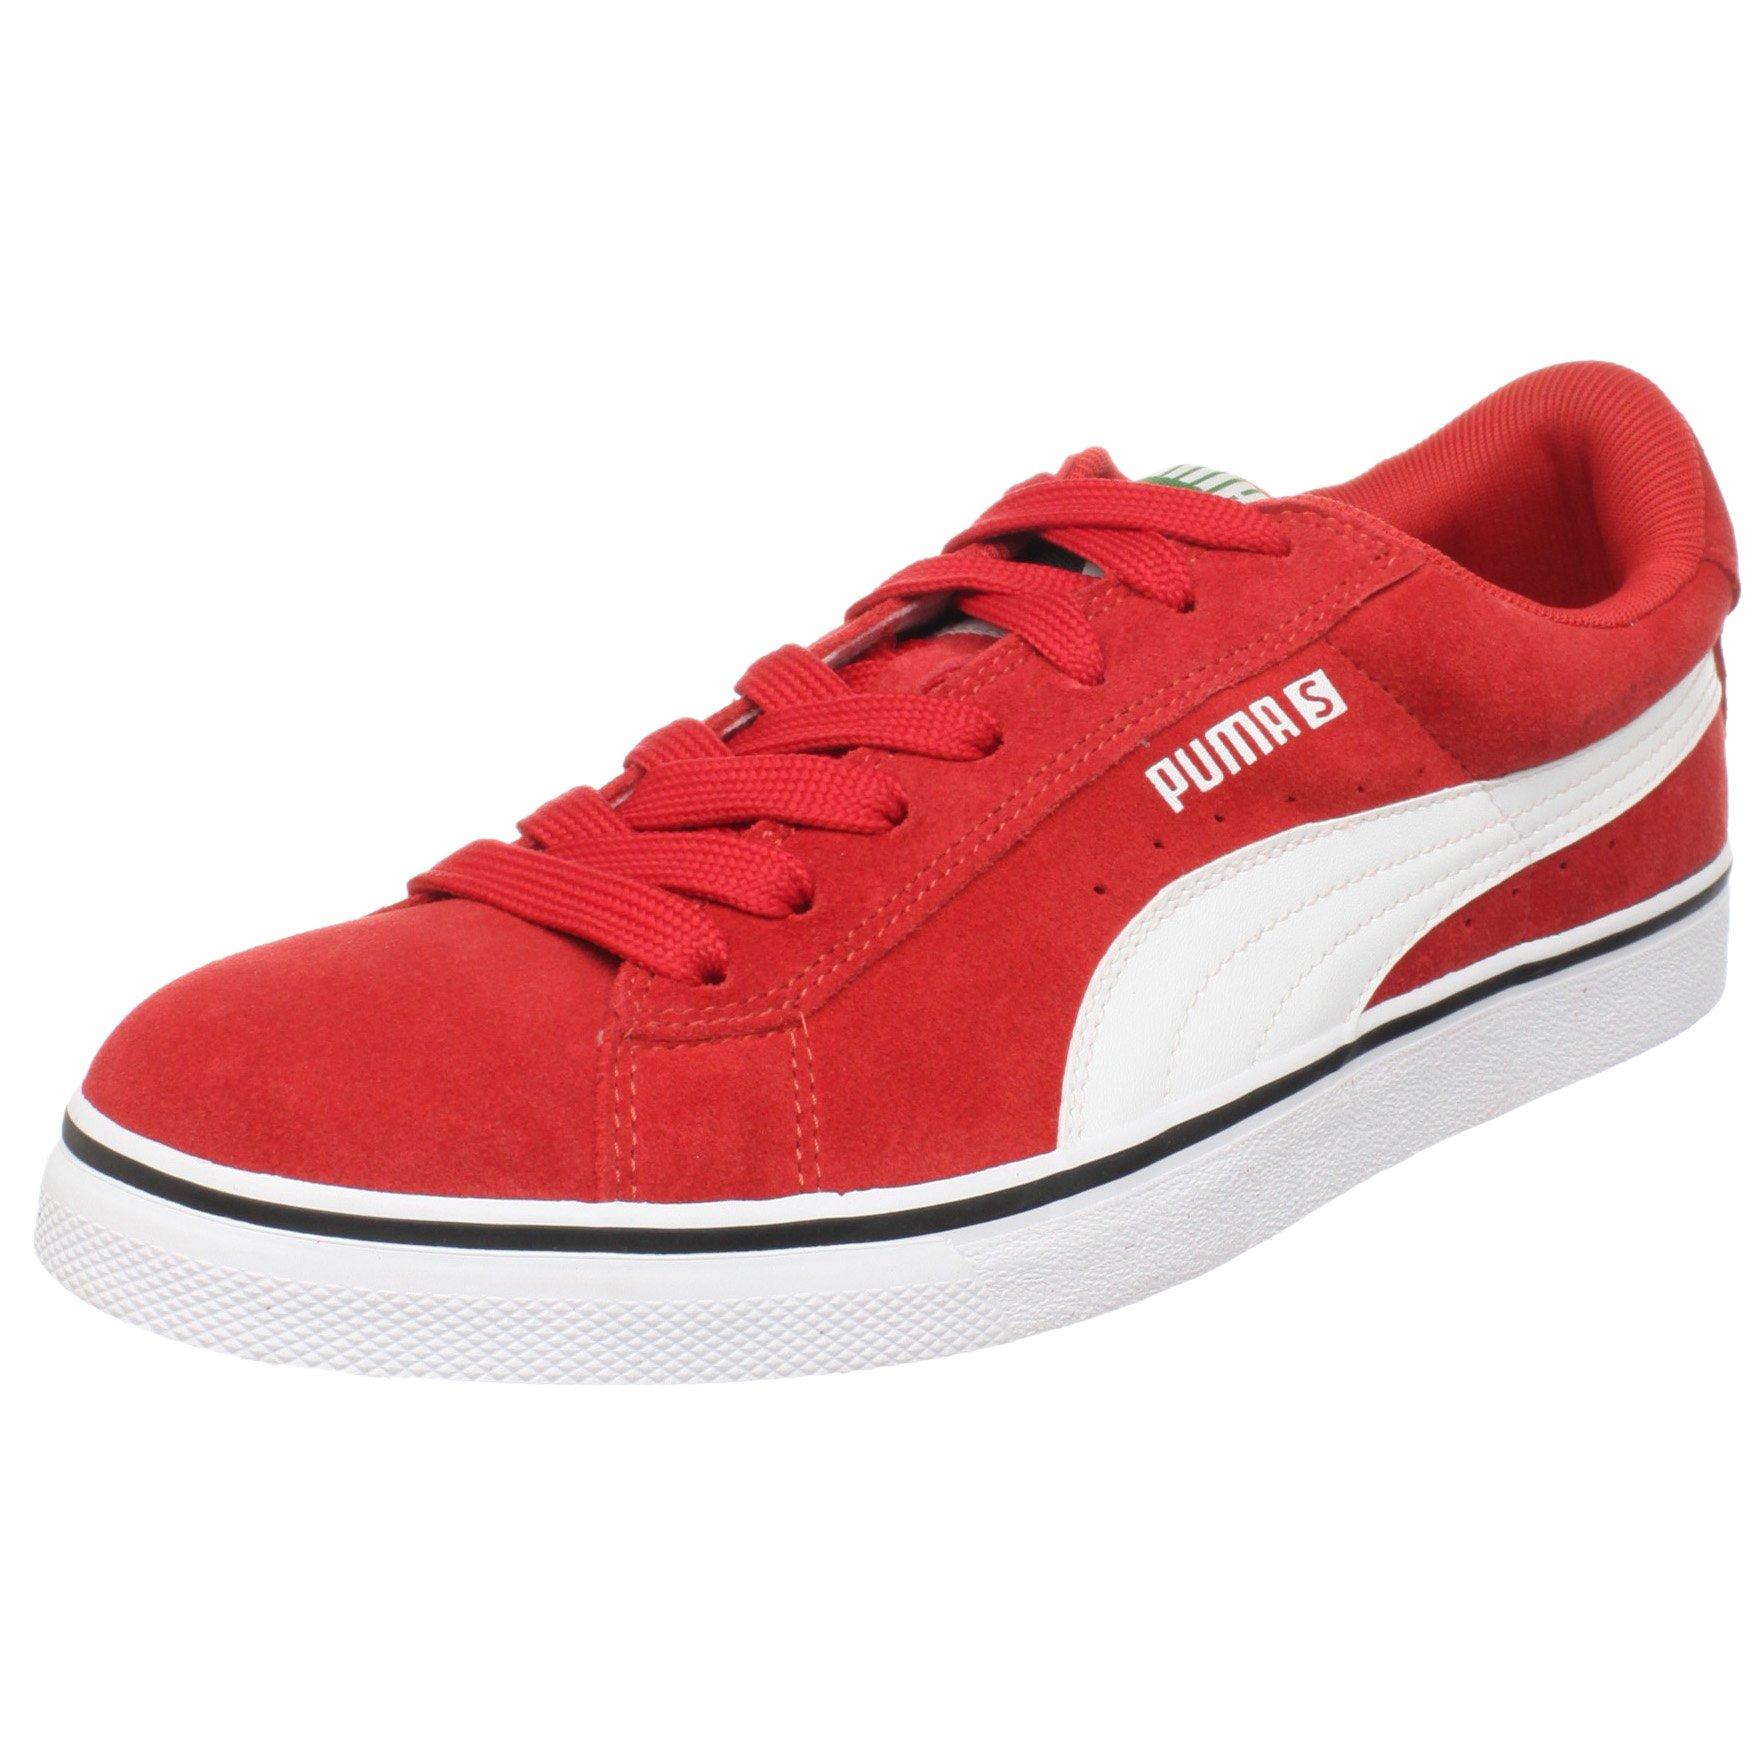 PUMA Leather Vulcanized Sneaker,High Risk Red/White,8 Men's D(M) US/9.5 Women's D(M) US